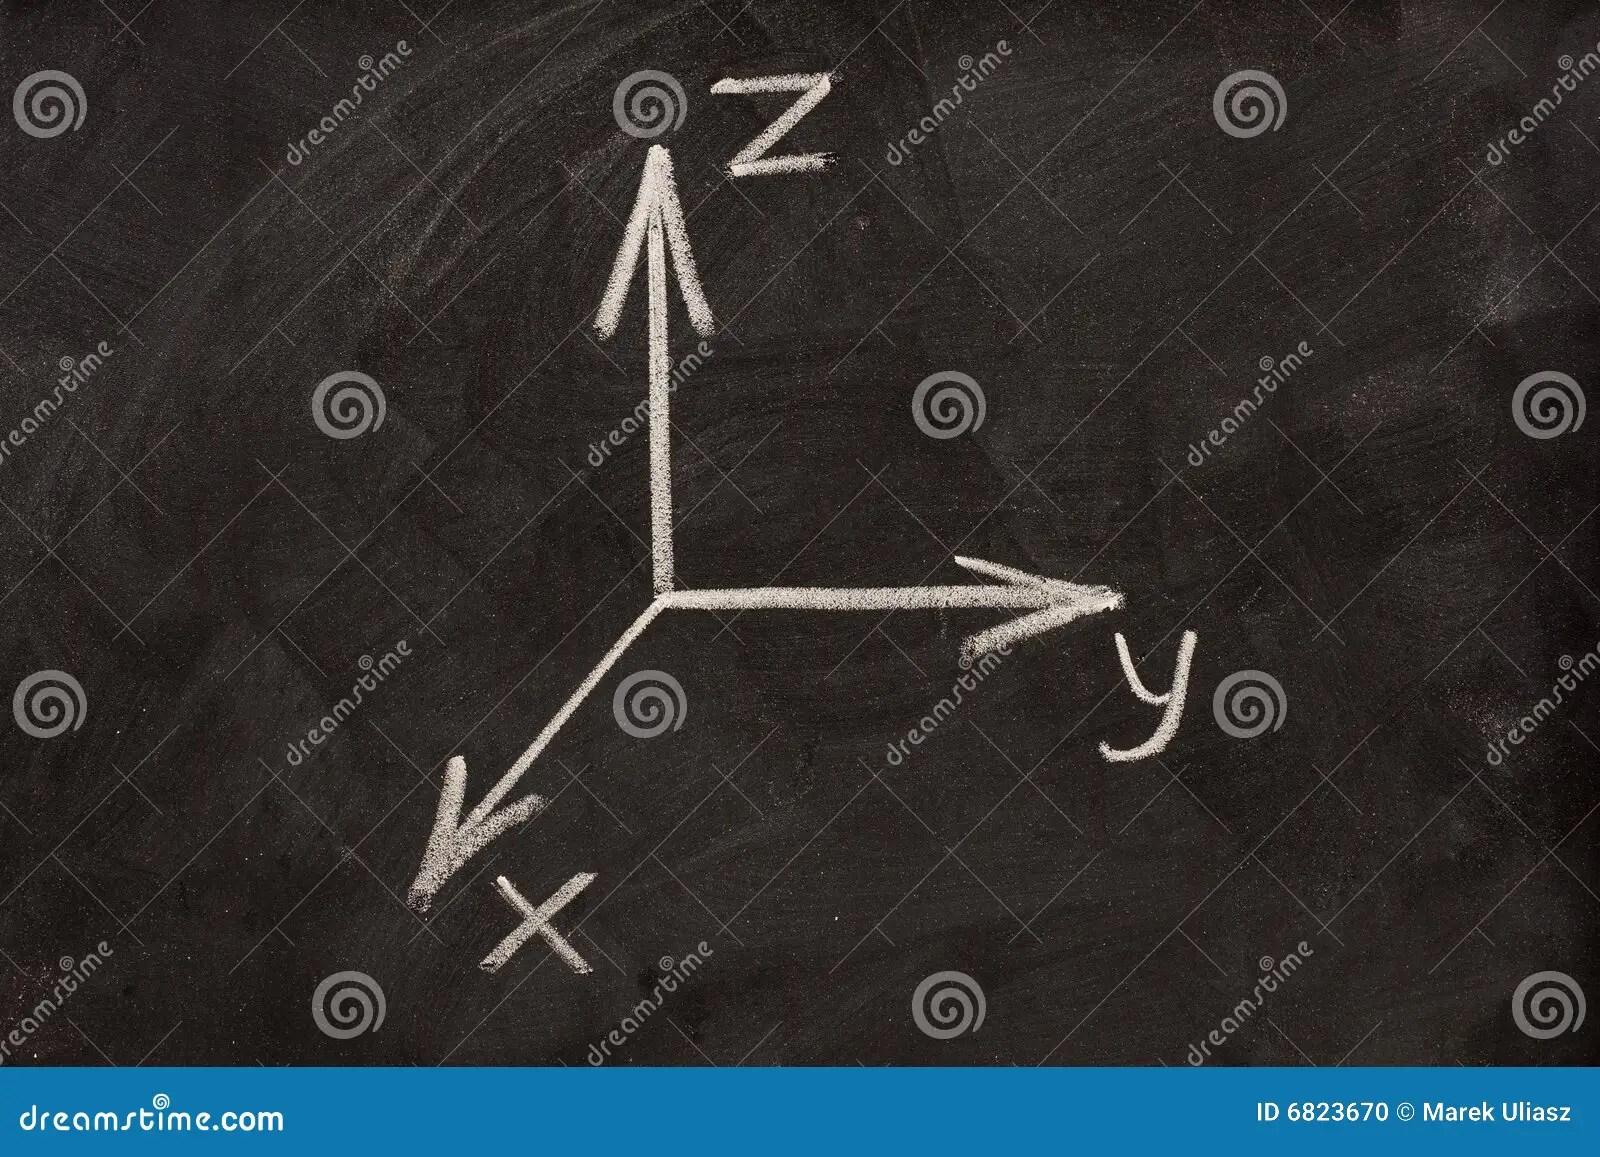 Cartesian Coordinate System On Blackboard Stock Photo